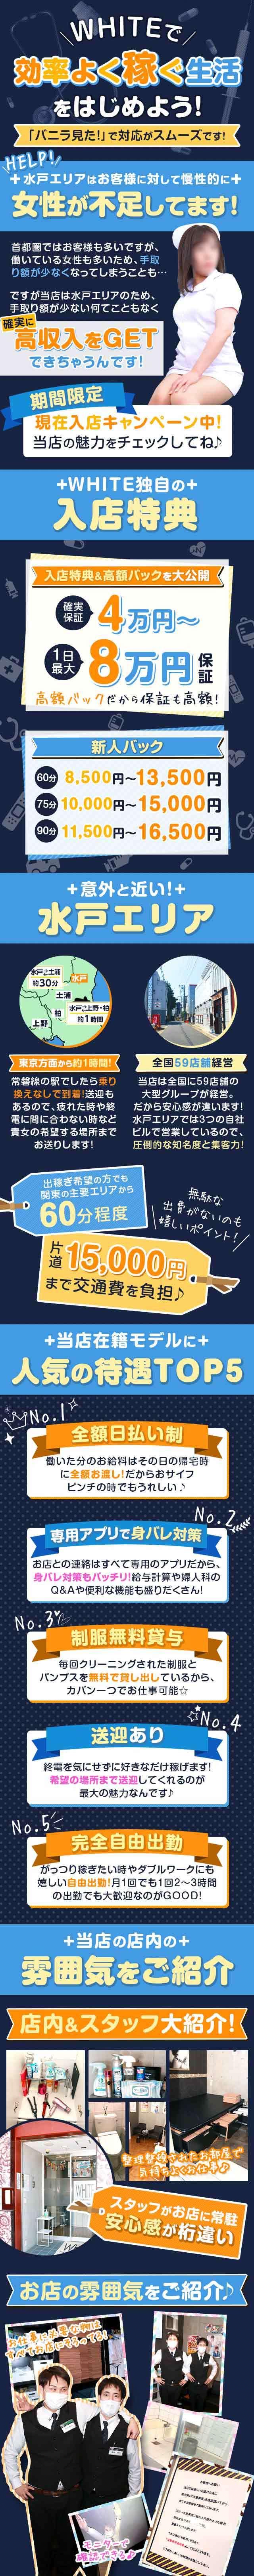 201202:WHITE-YESグループ(急募)